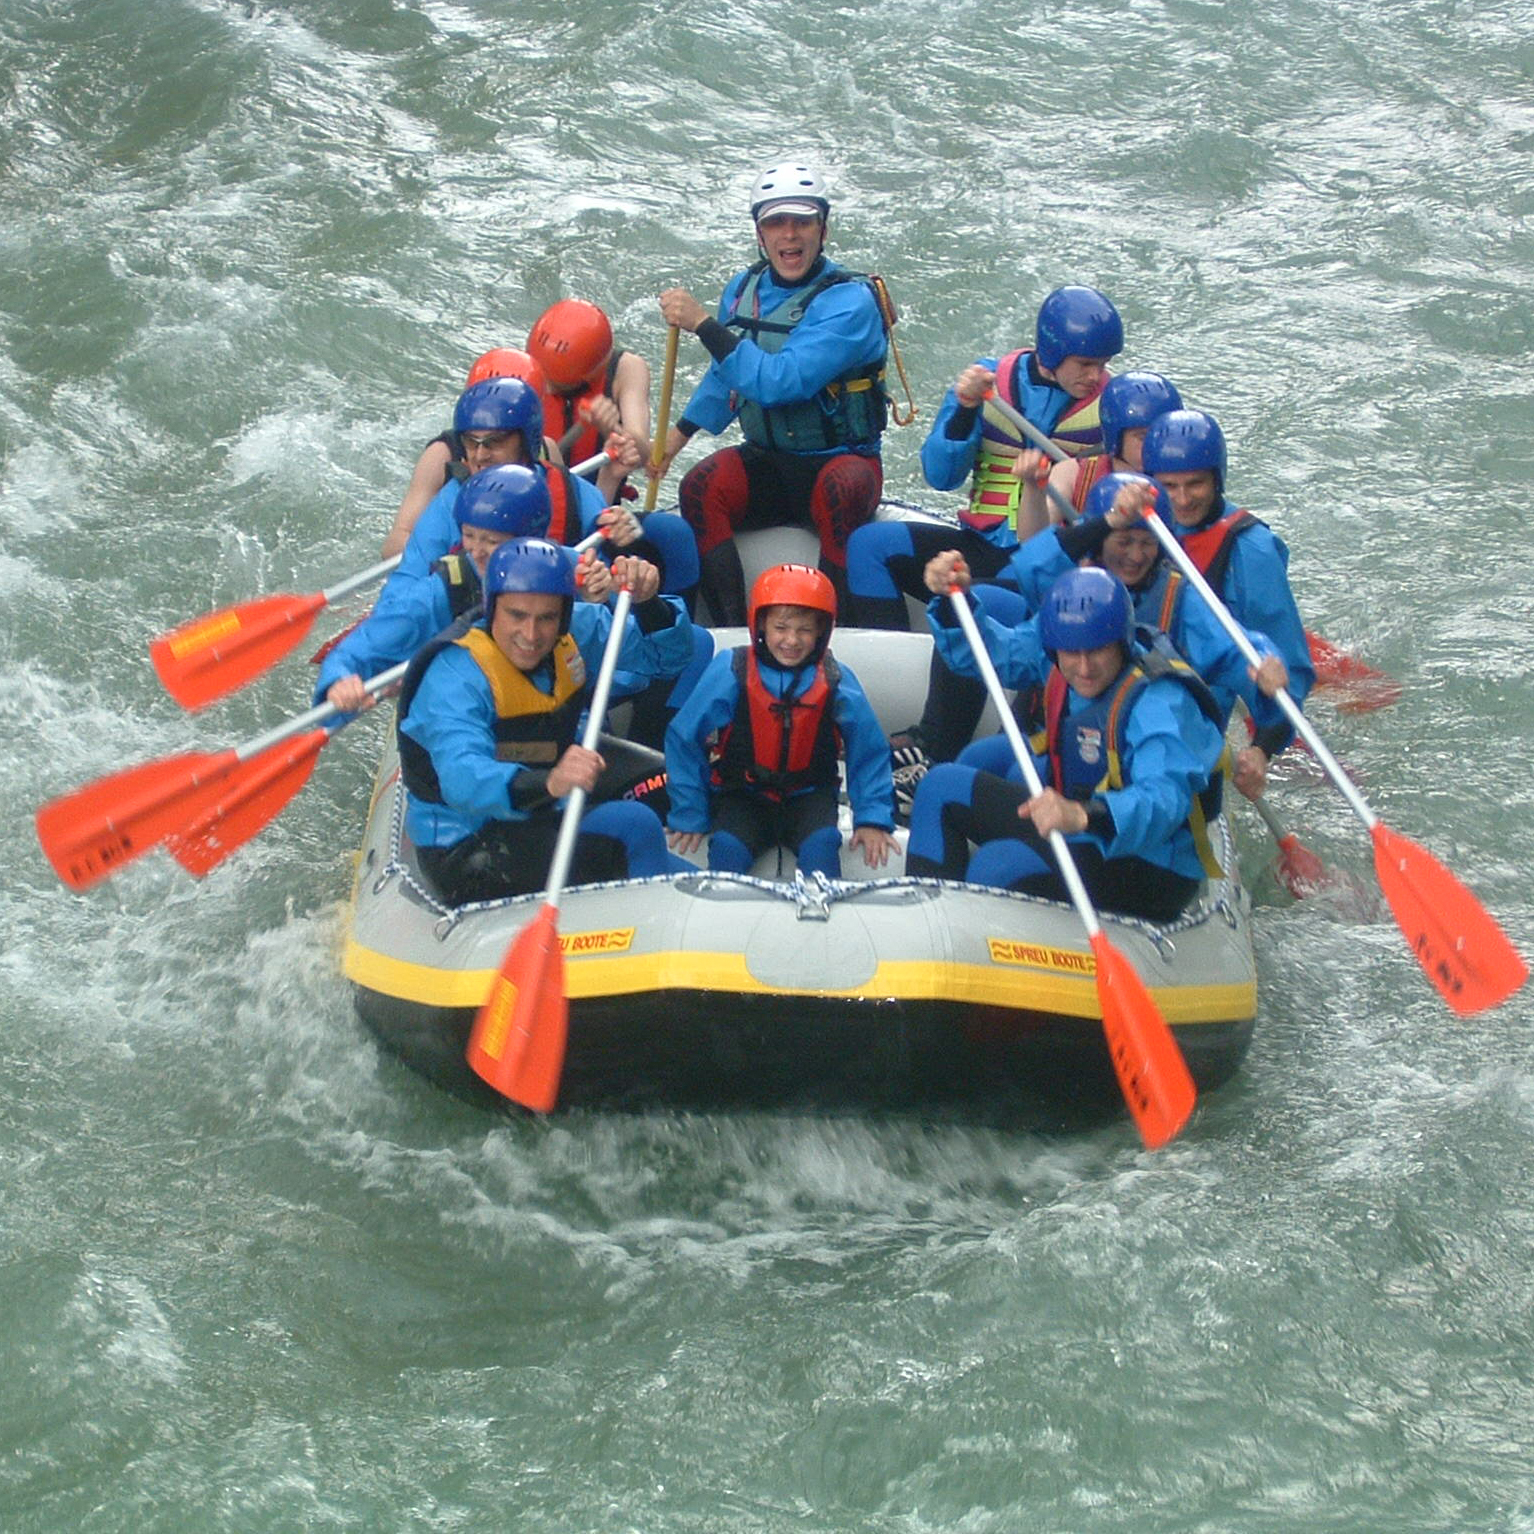 Gruppe beim Wildwasserrafting